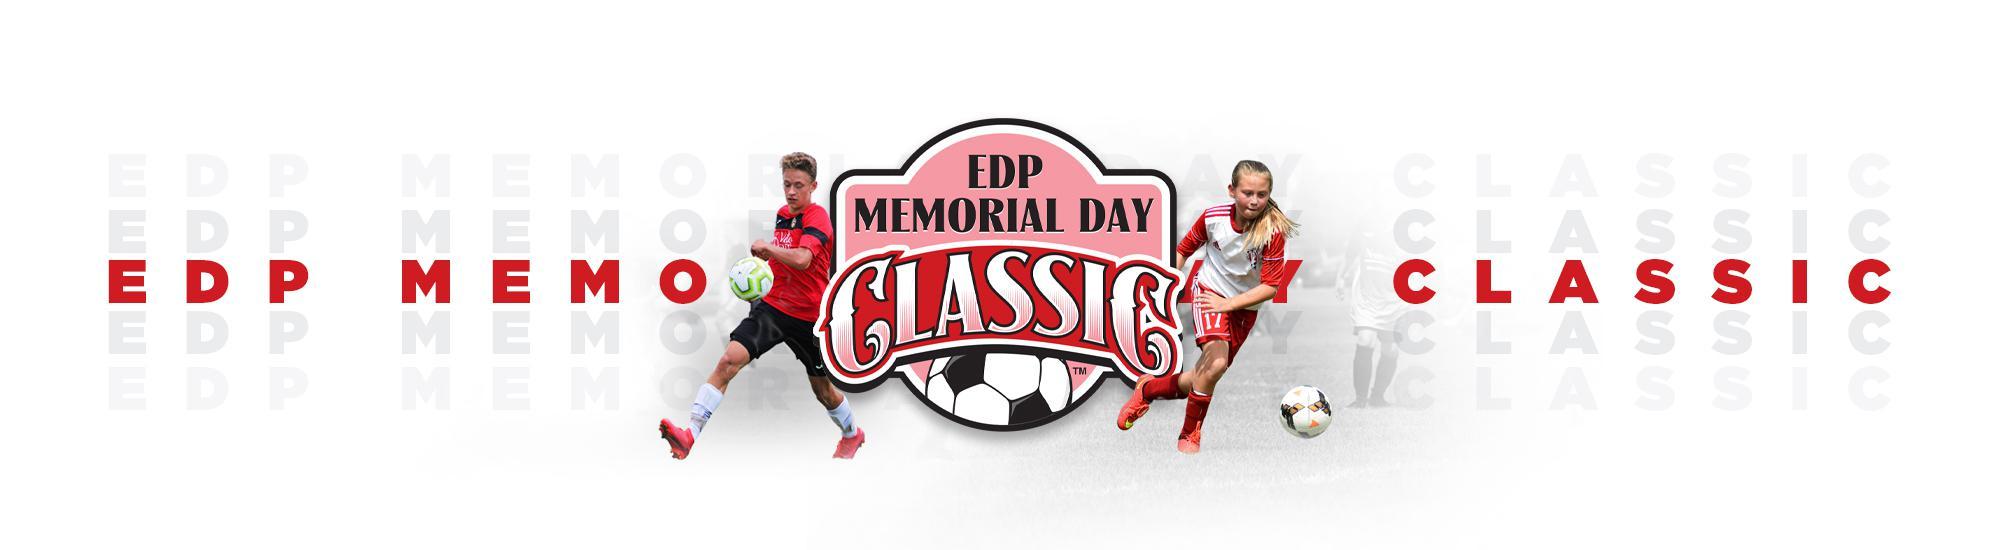 EDP Memorial Day Classic